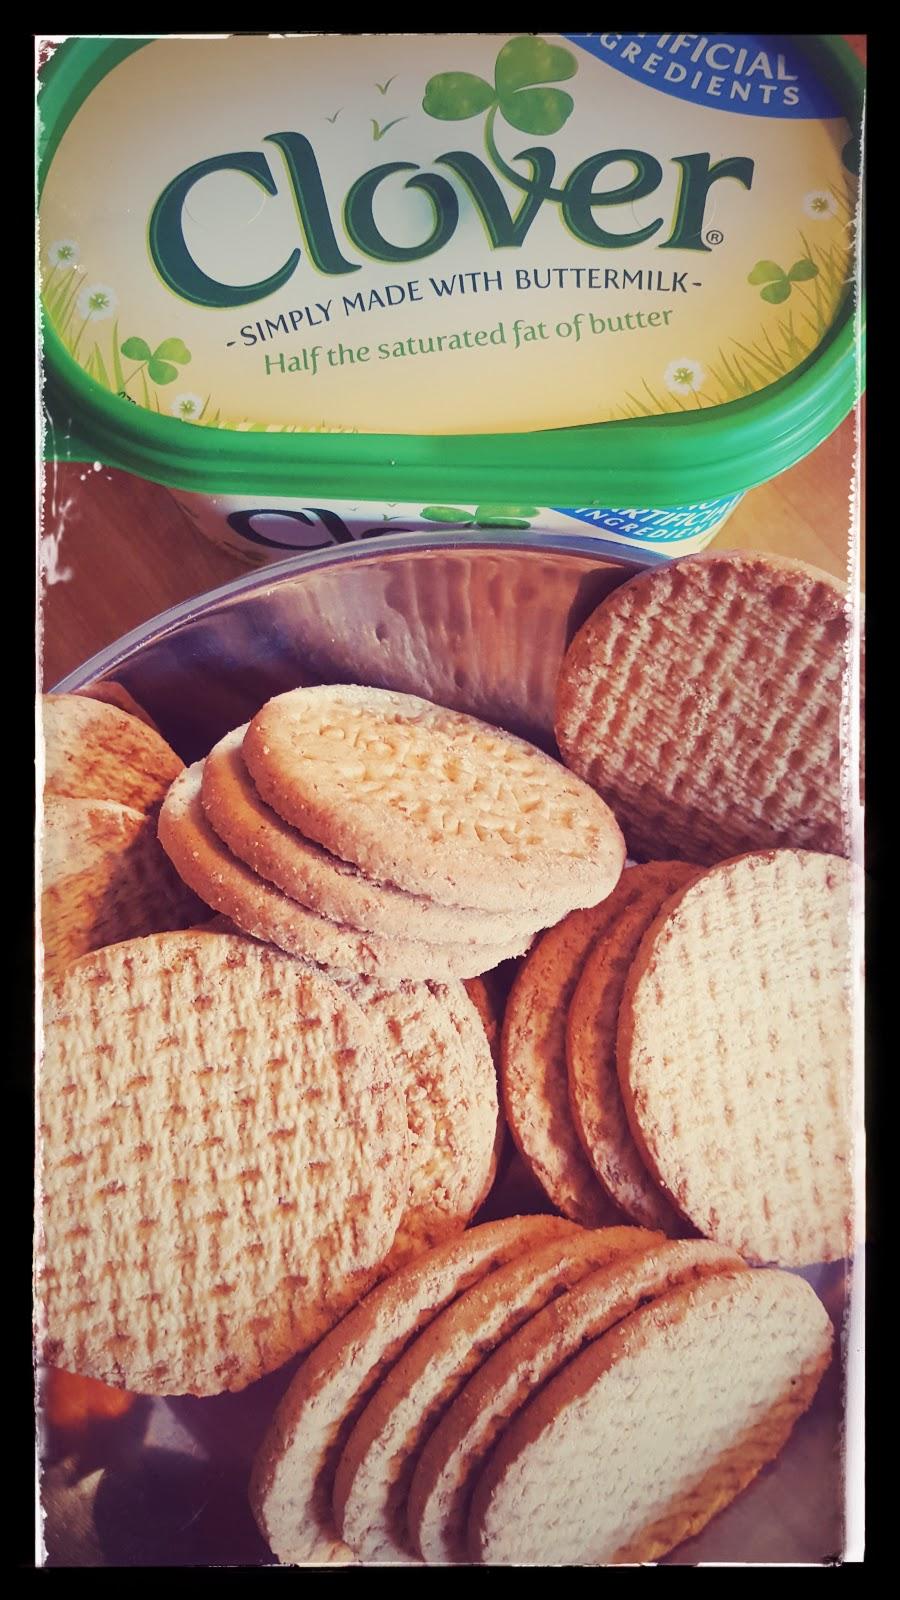 Sweet And Sour Satsuma and kiwi Pie: How To Make One!